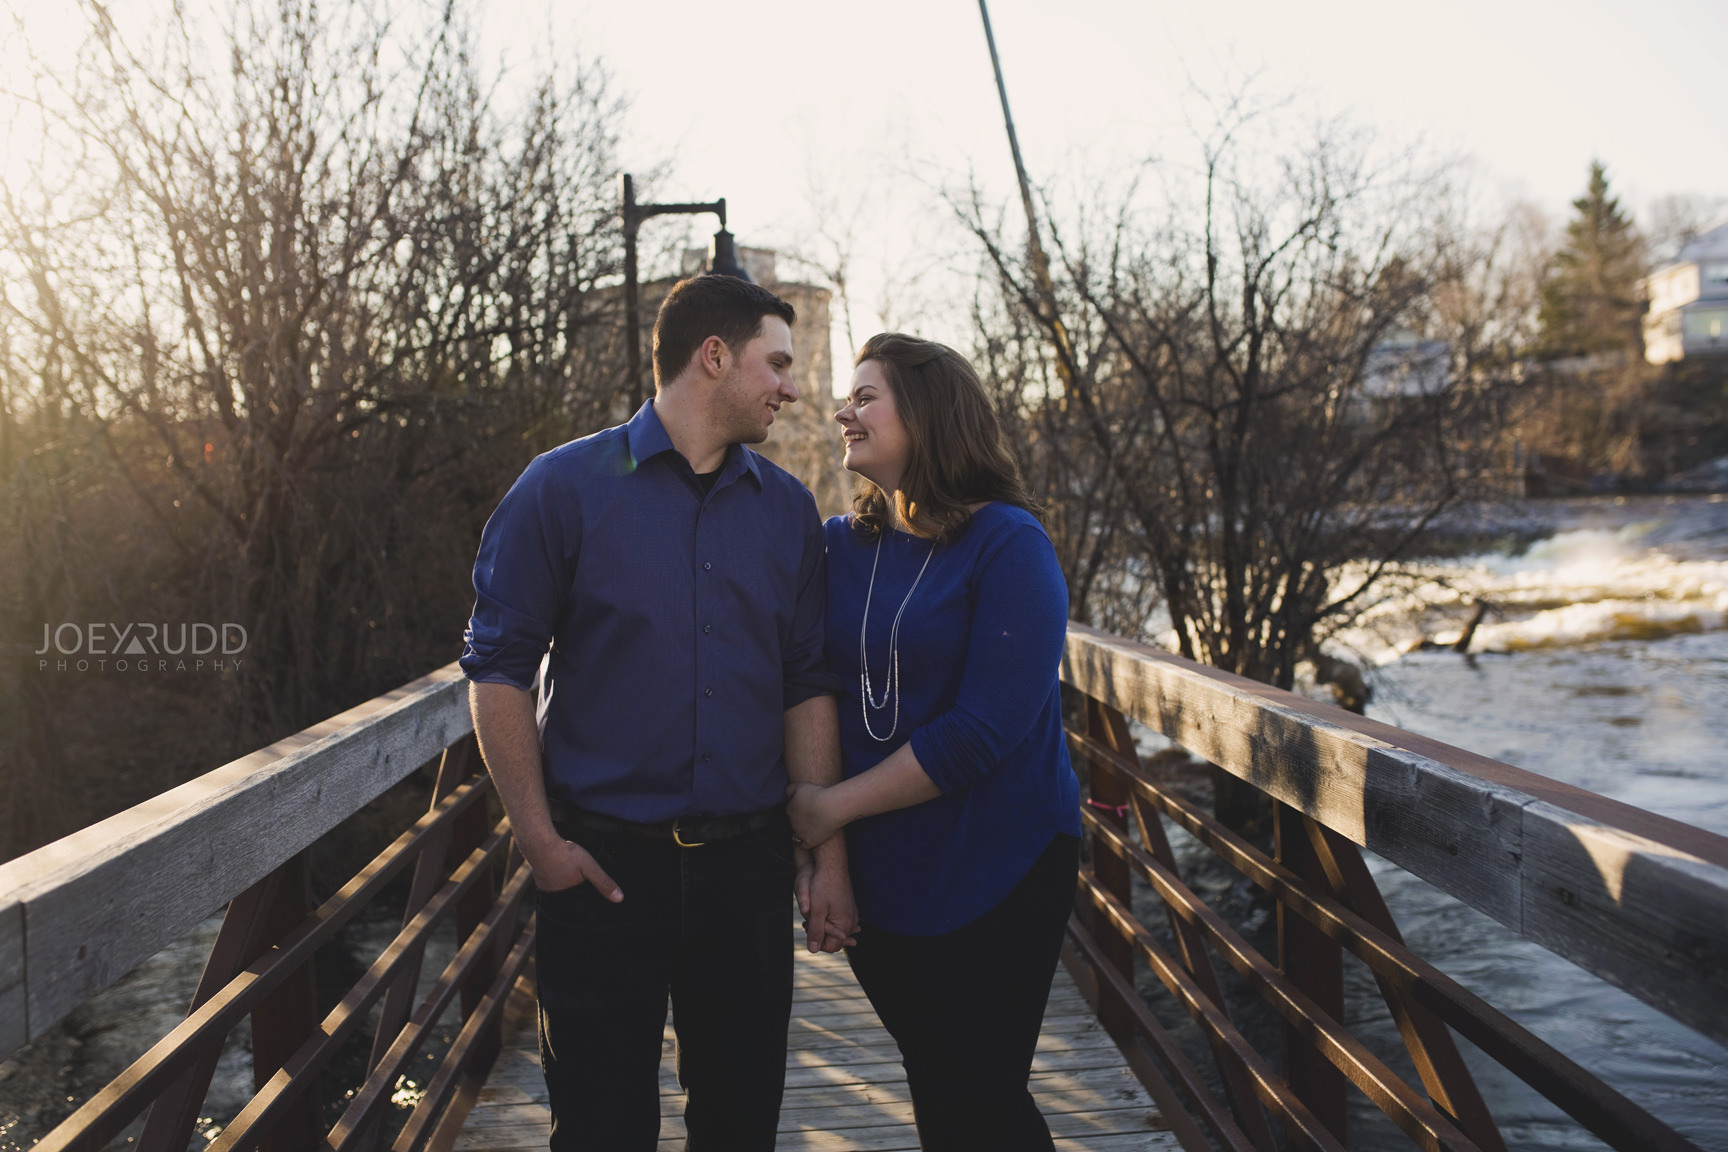 Almonte engagement photography by ottawa wedding photographer joey rudd photography lifestyle